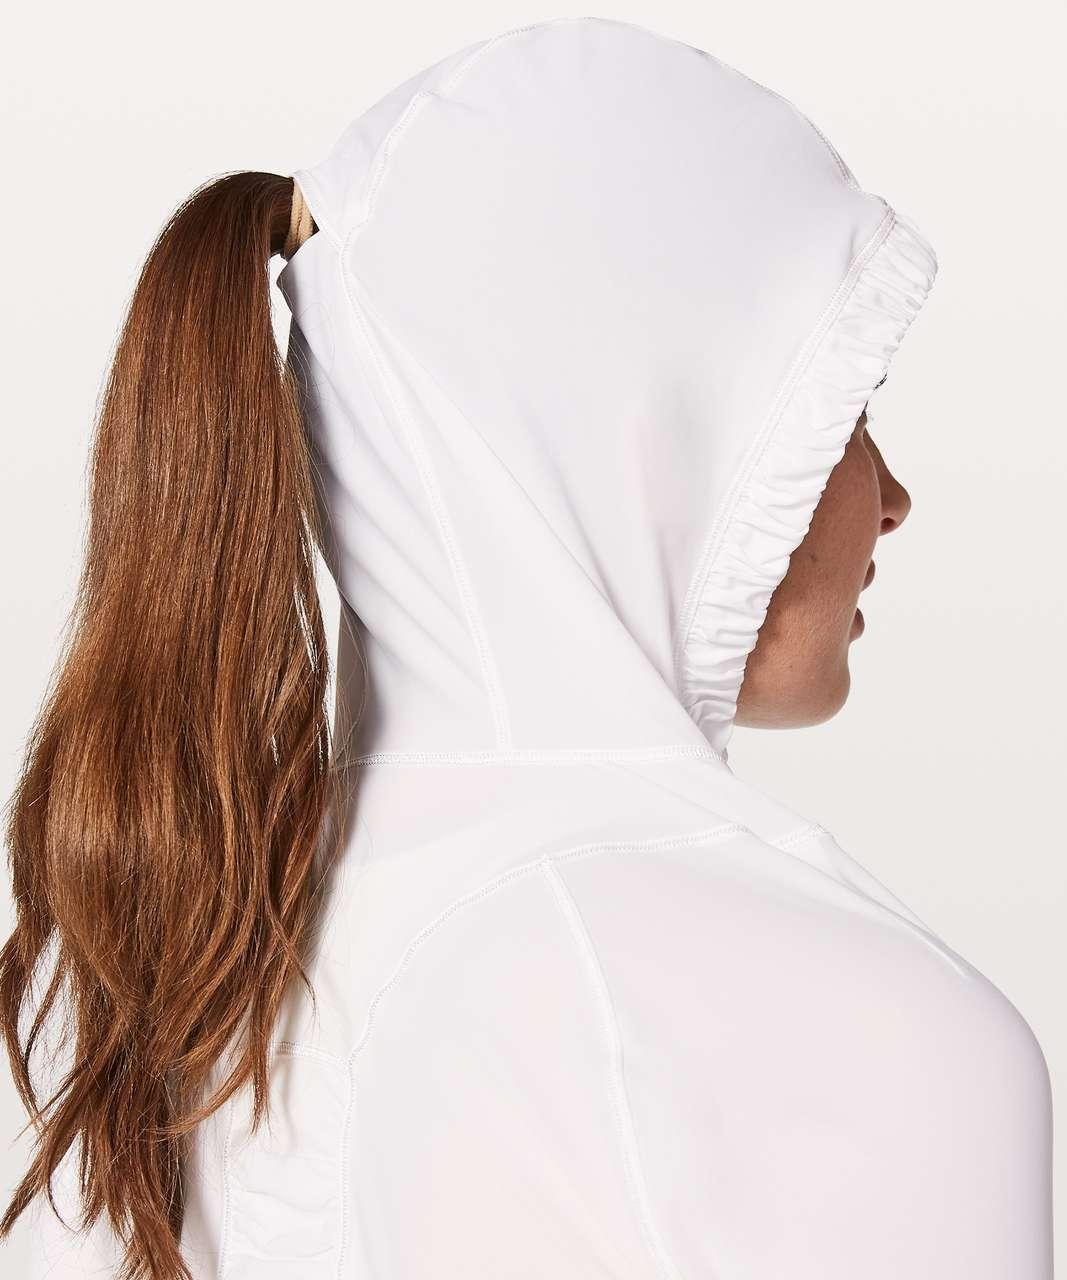 Lululemon Water Bound Hoodie - White